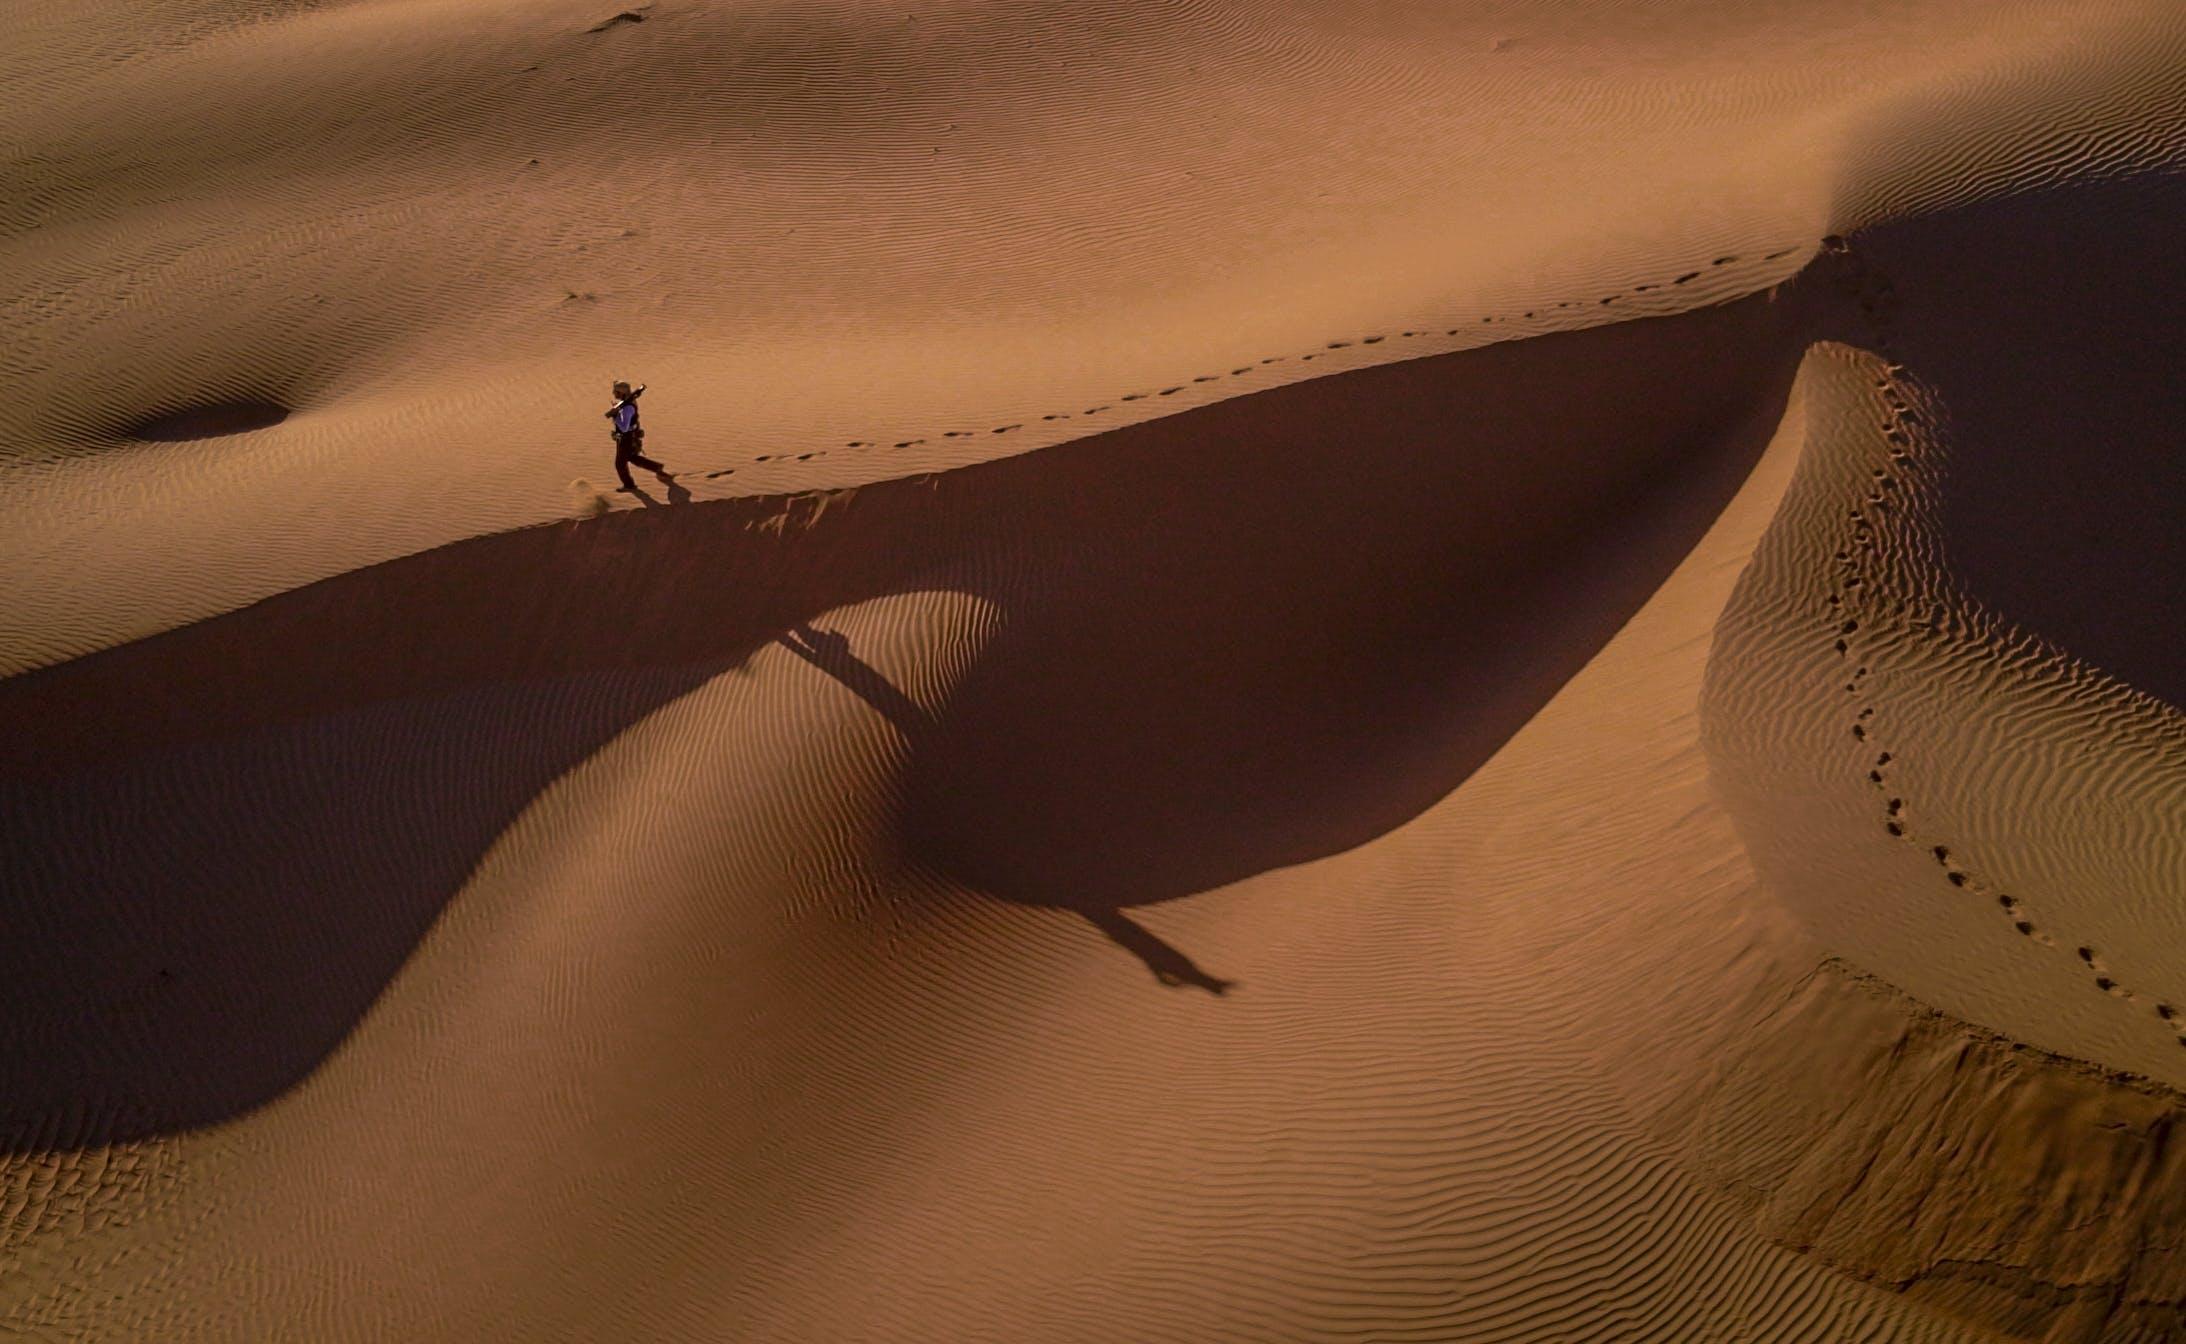 Person Walking on Desert